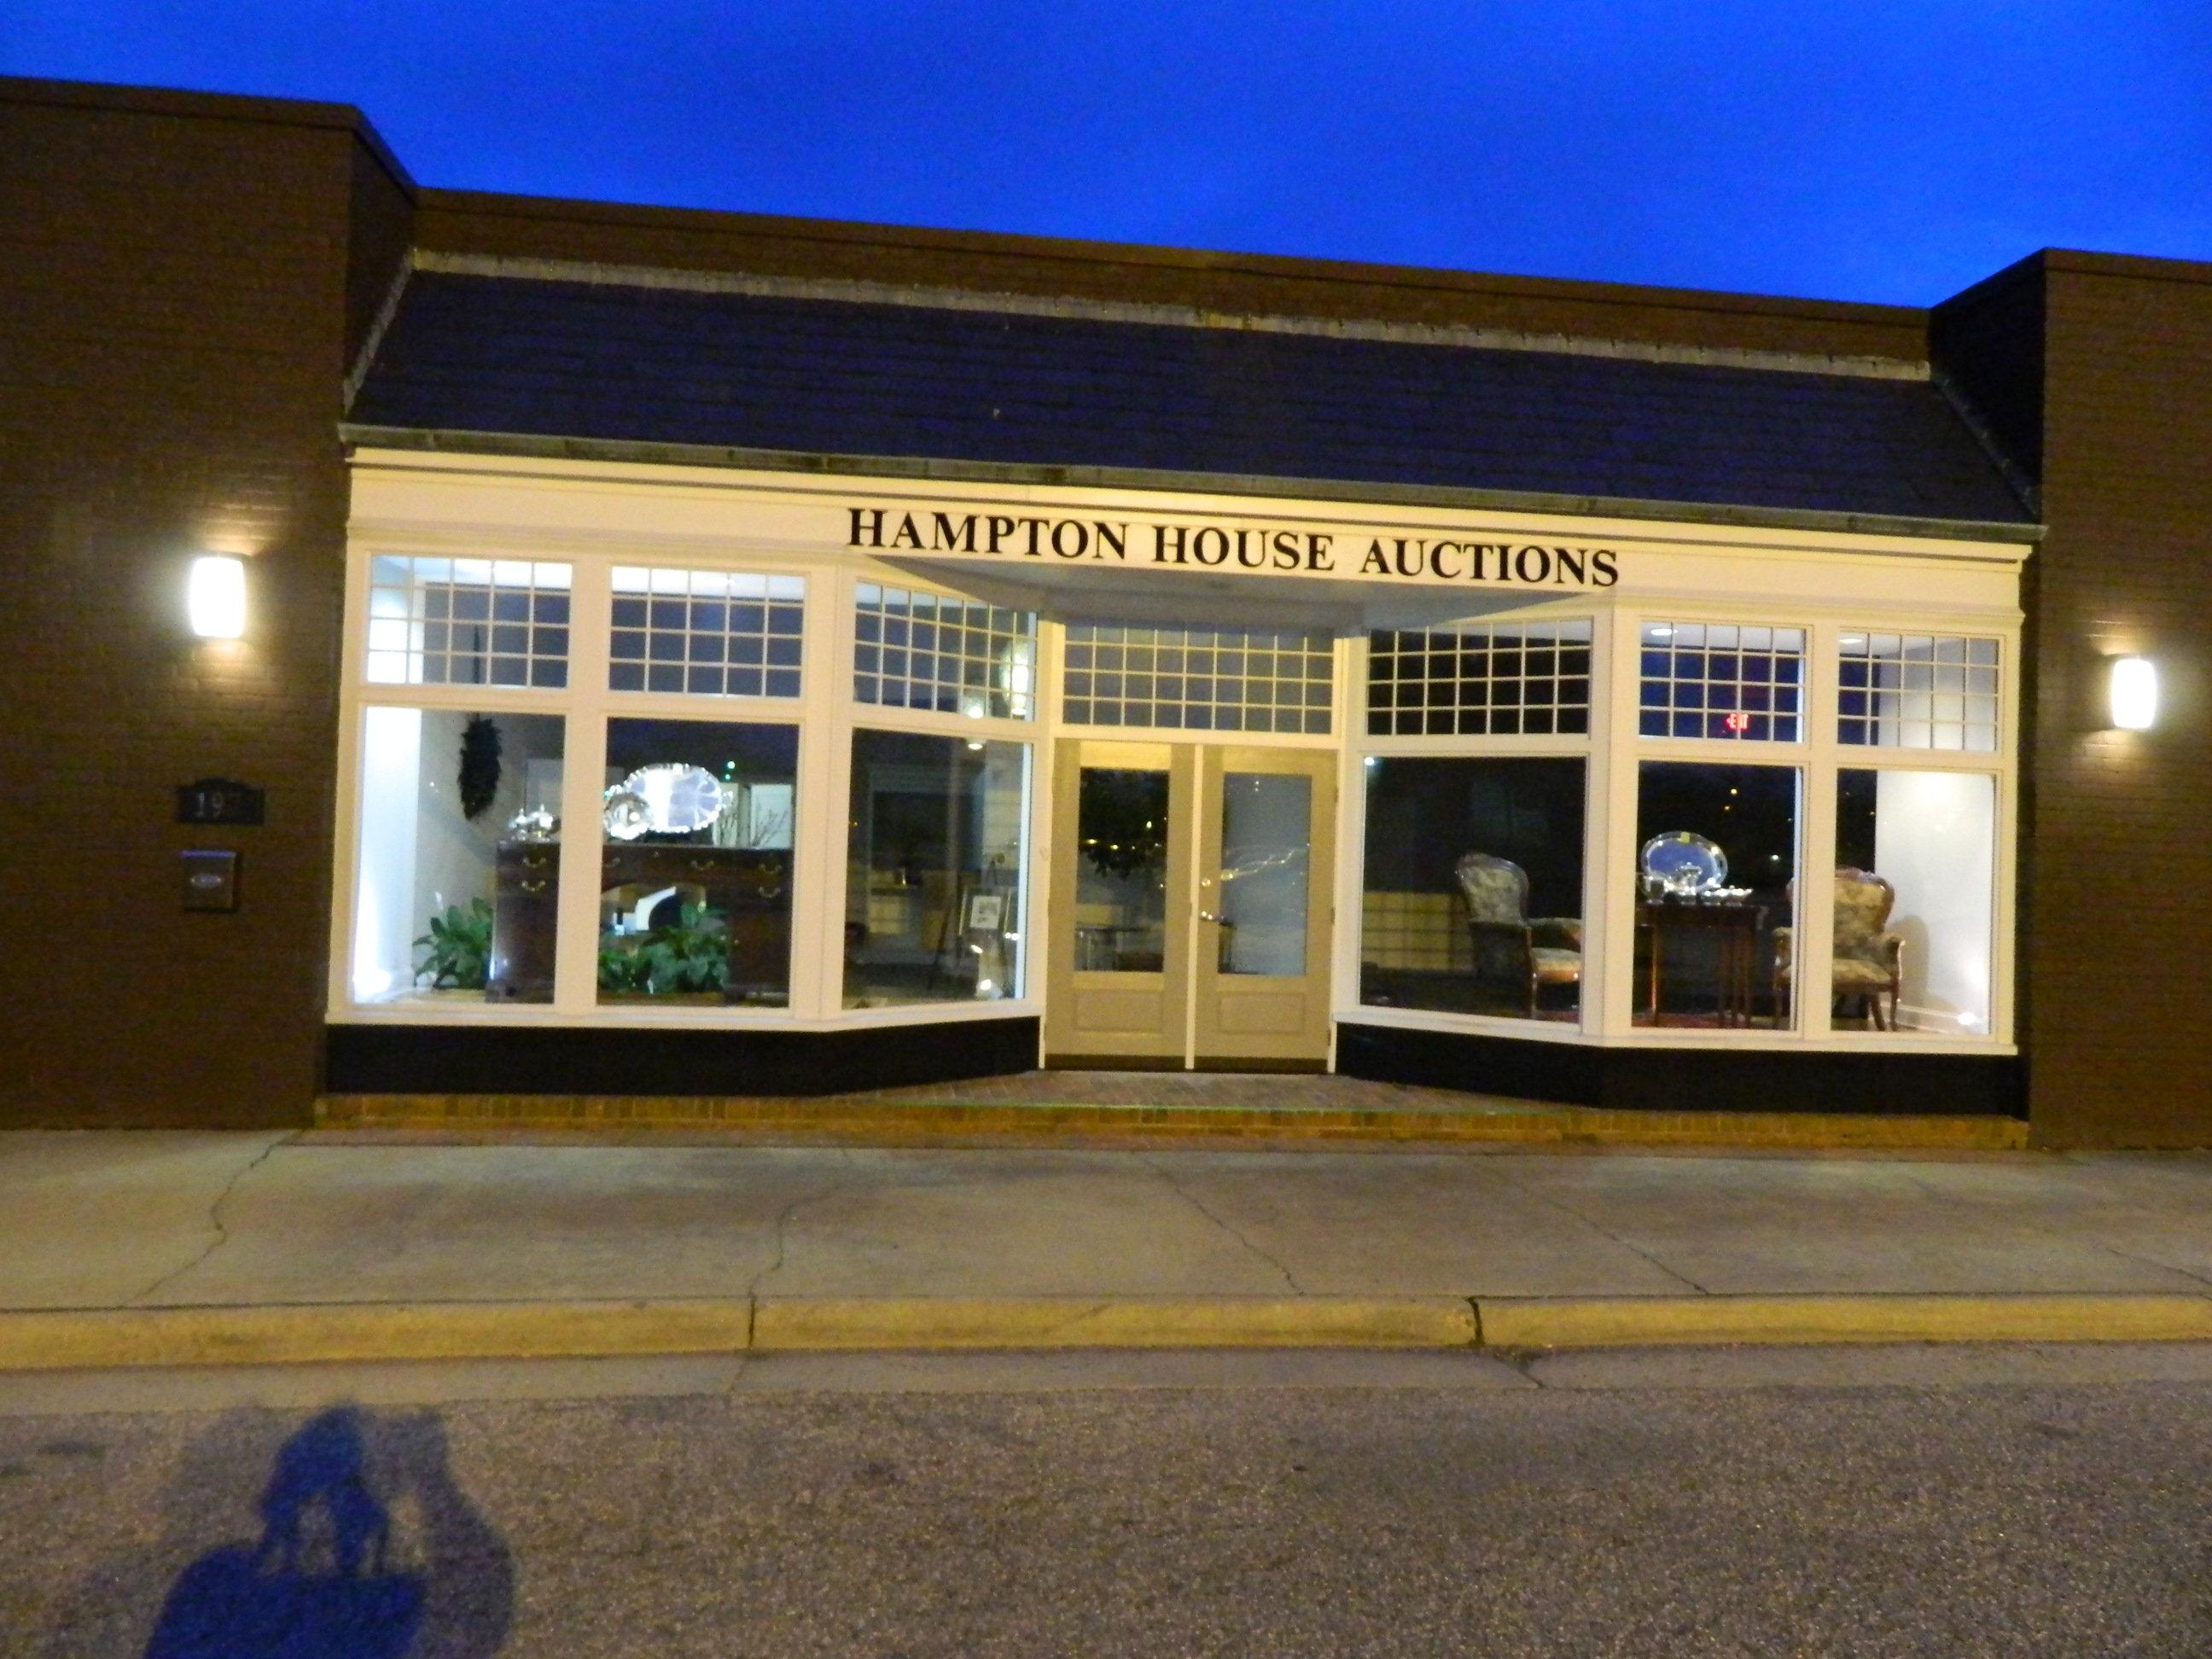 Hampton House Auctions